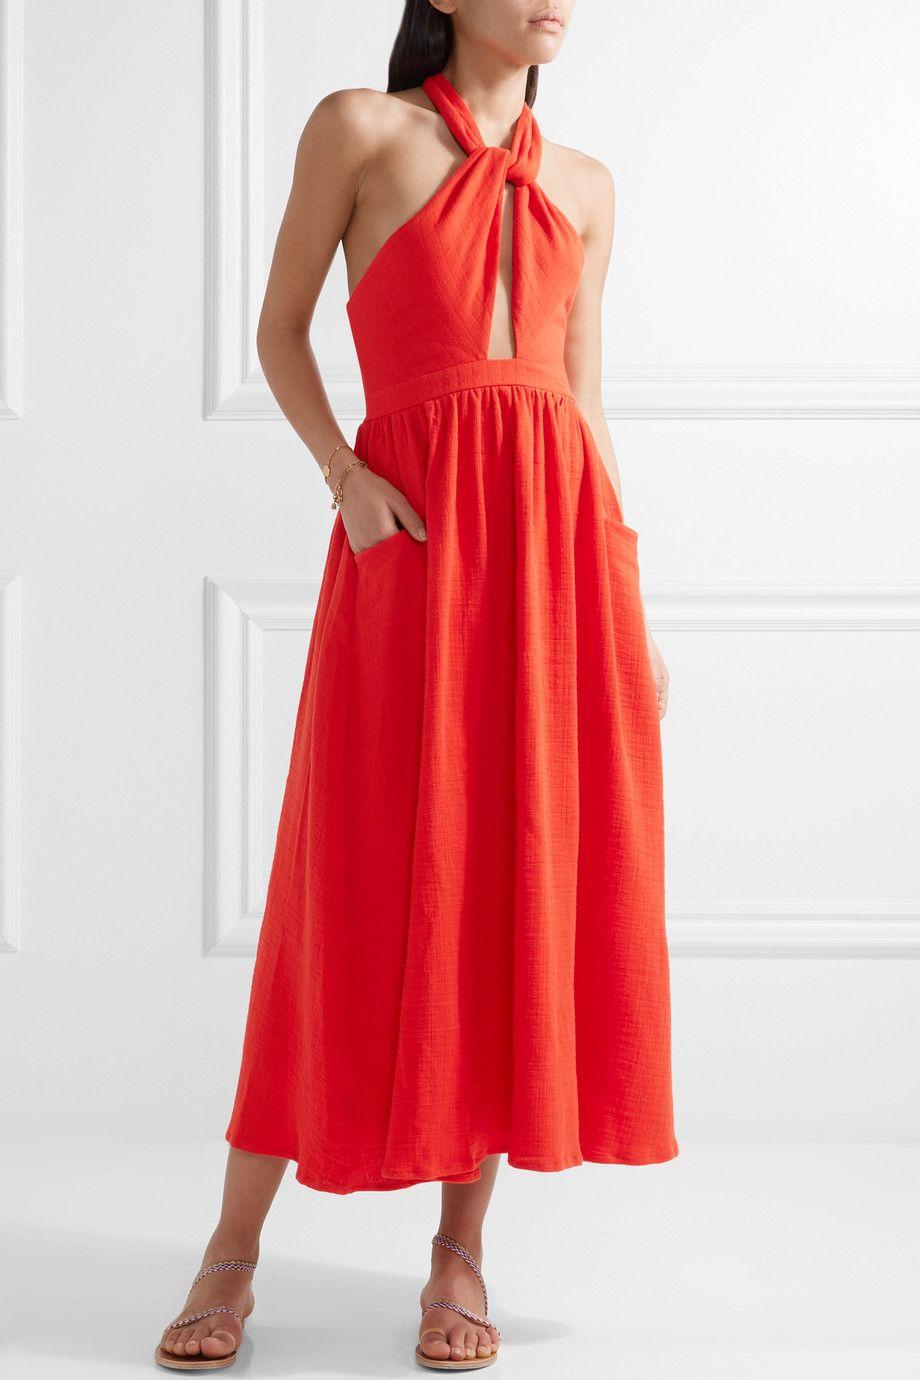 A model wearing a red dress